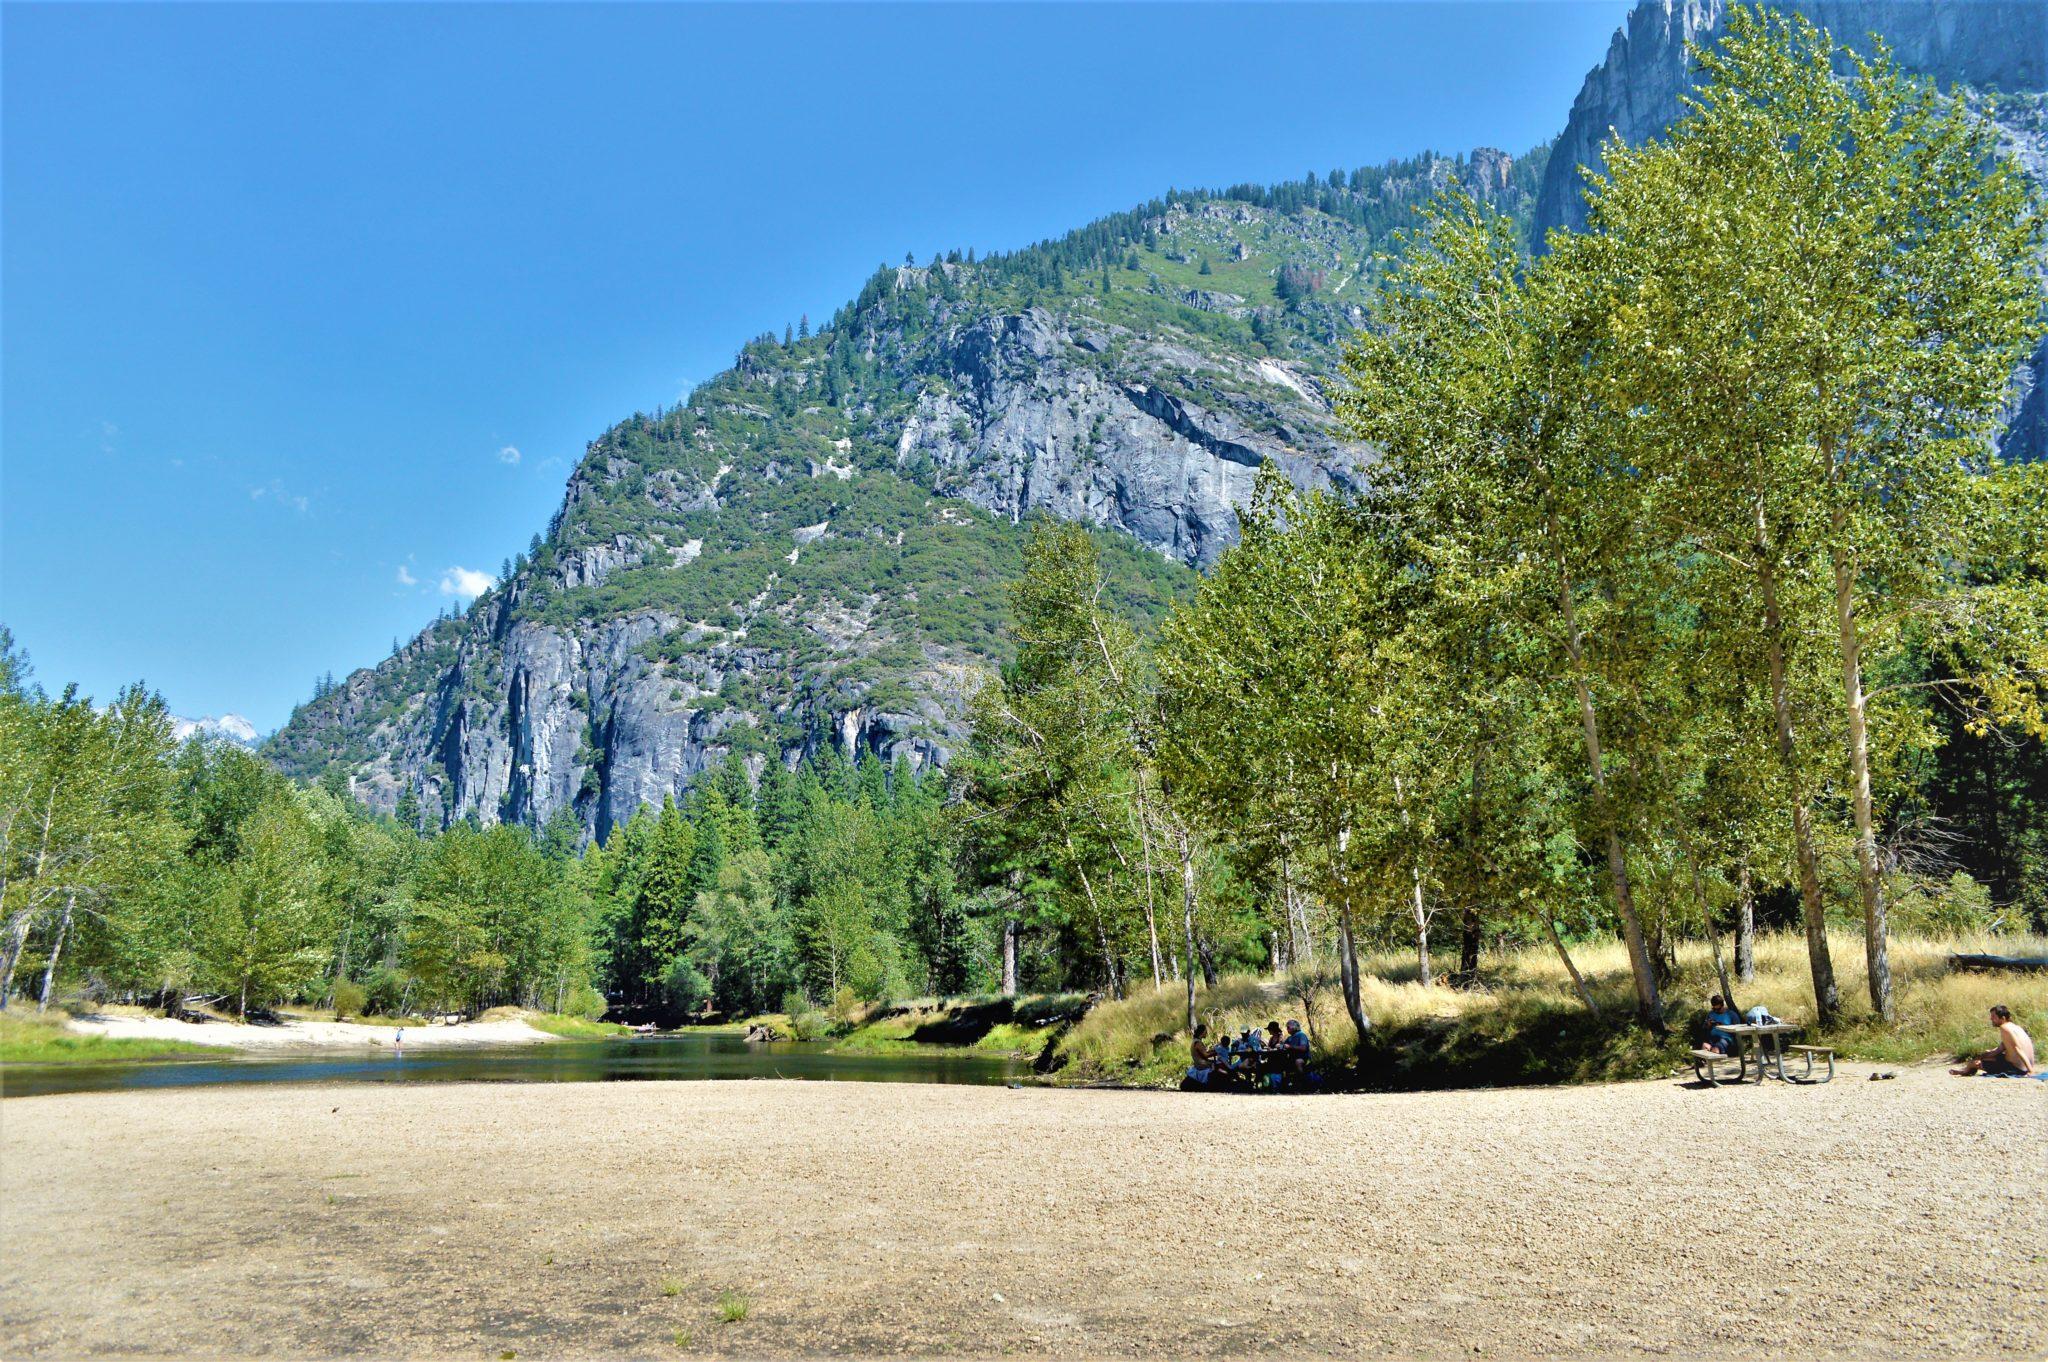 Lake at Yosemite National Park, California